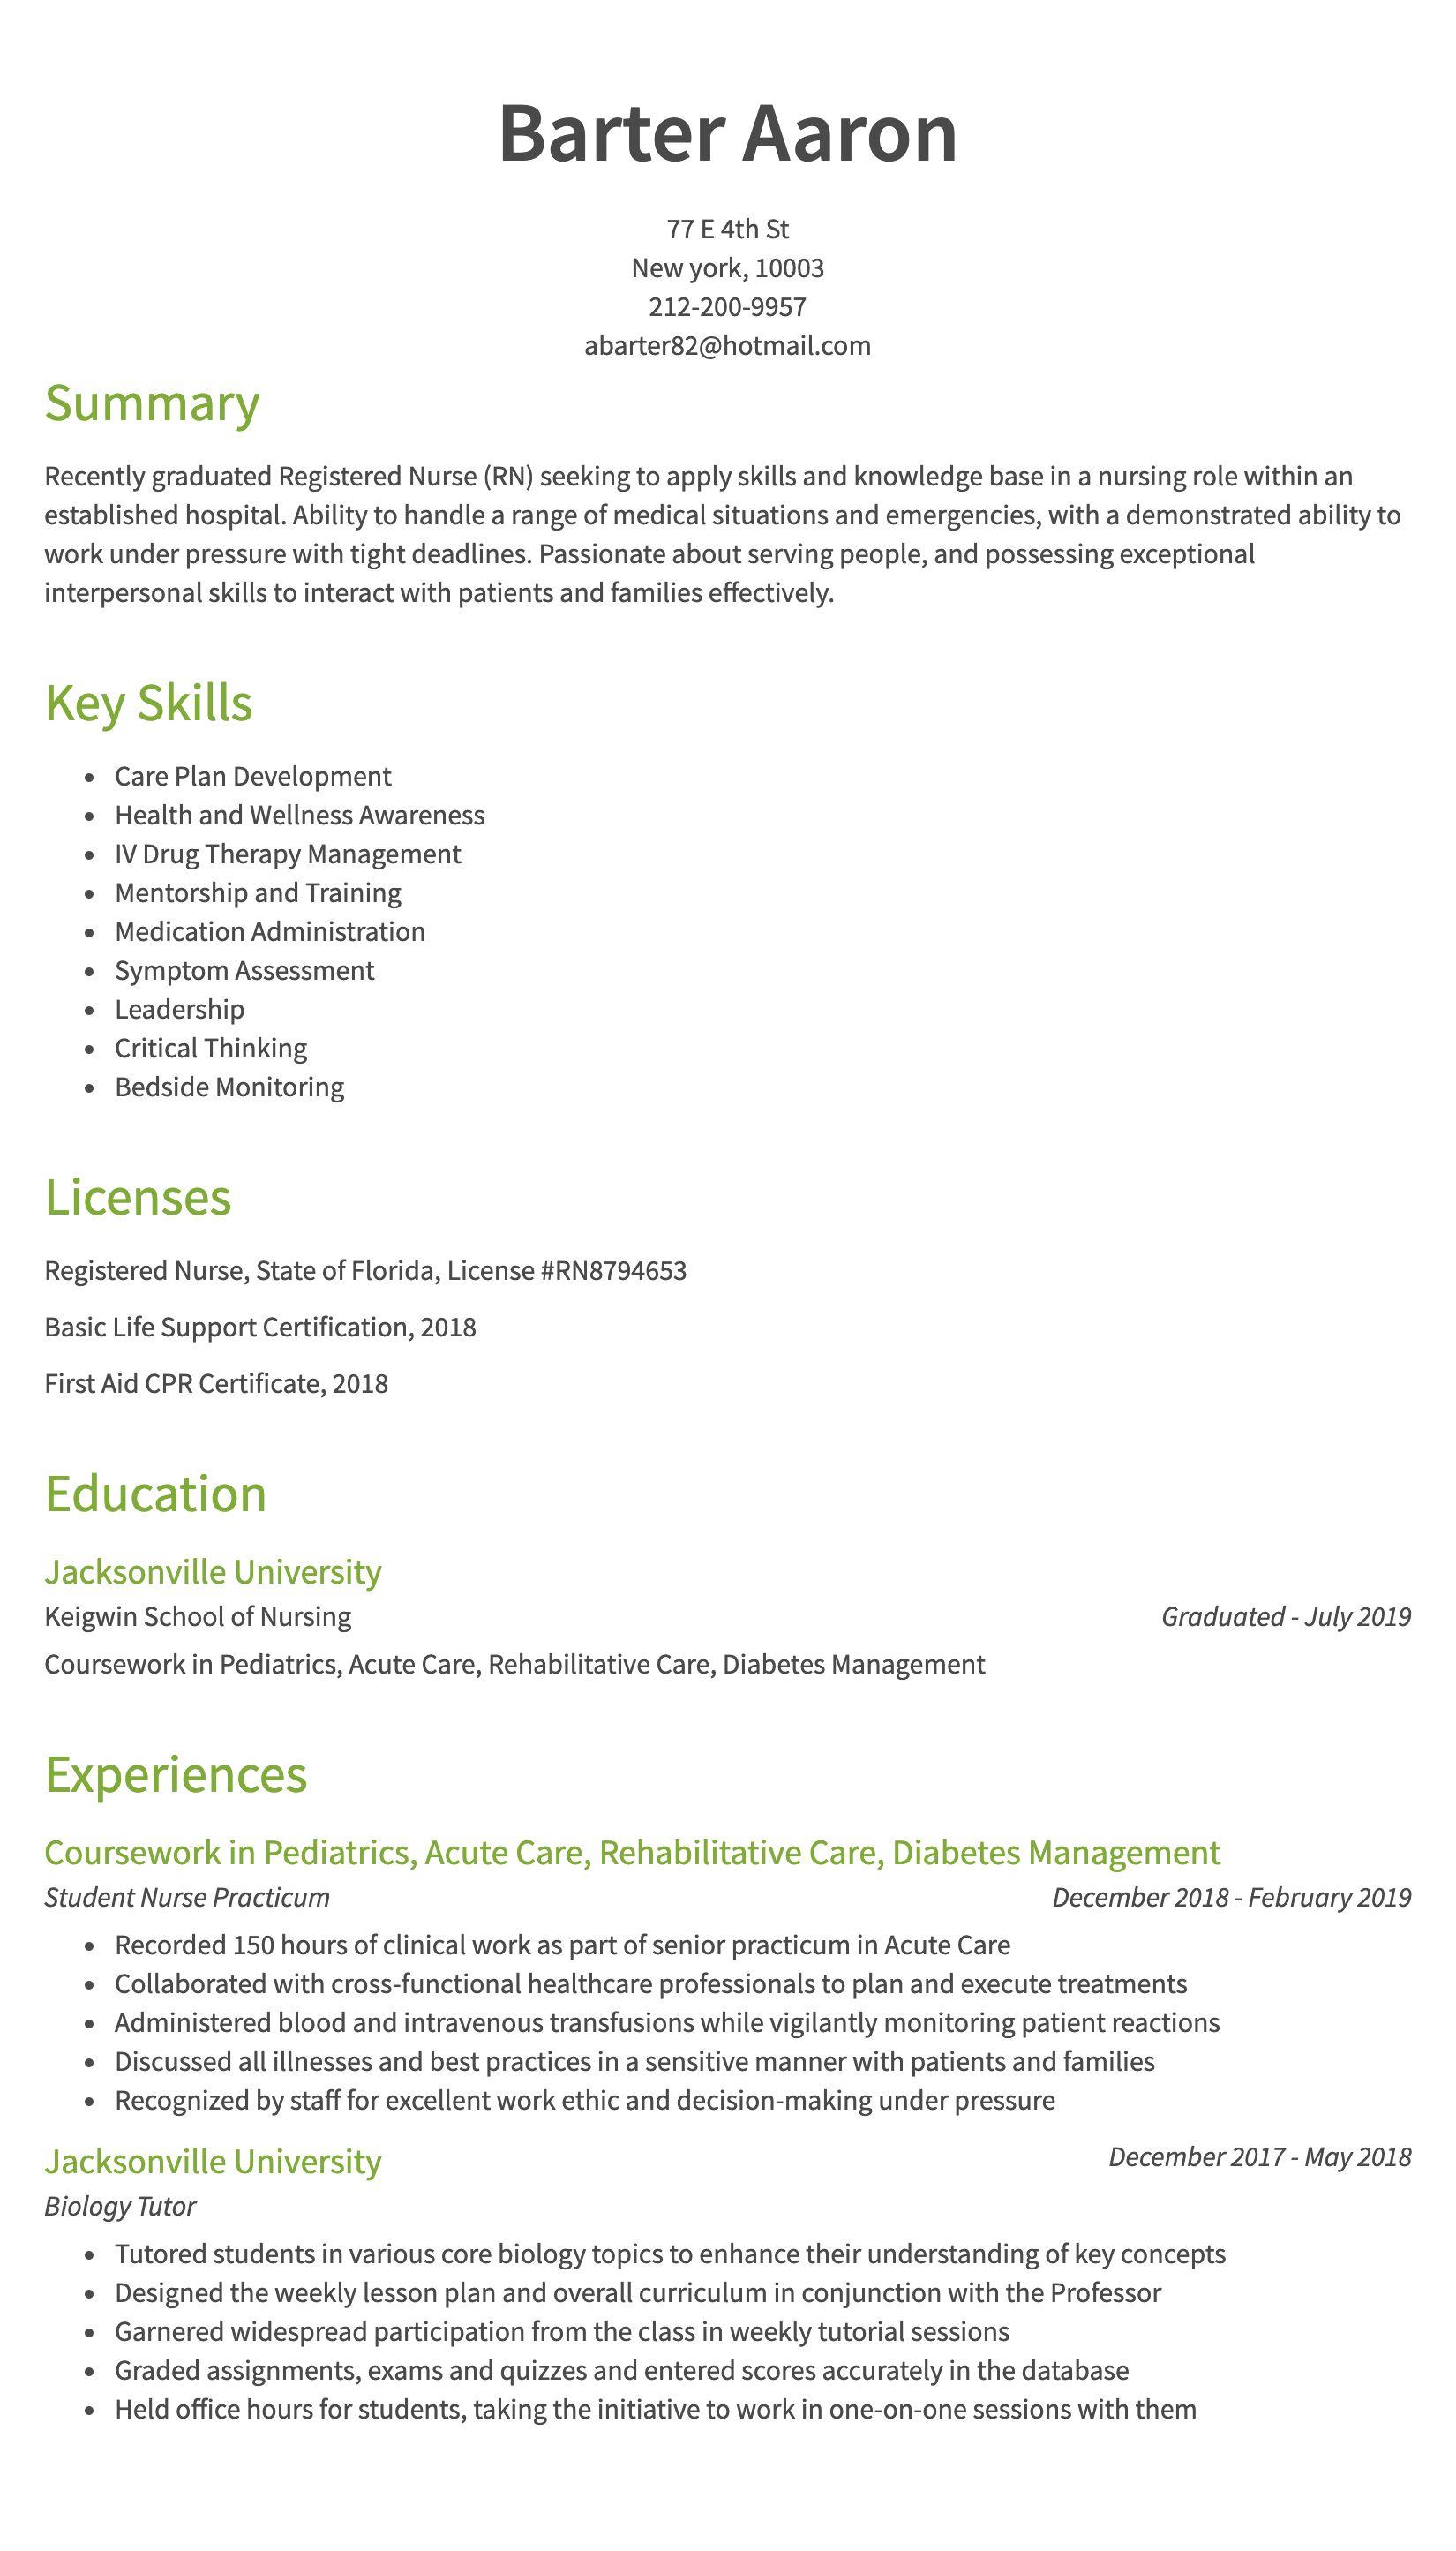 007 Striking Rn Graduate Resume Template High Resolution  New Grad NurseFull